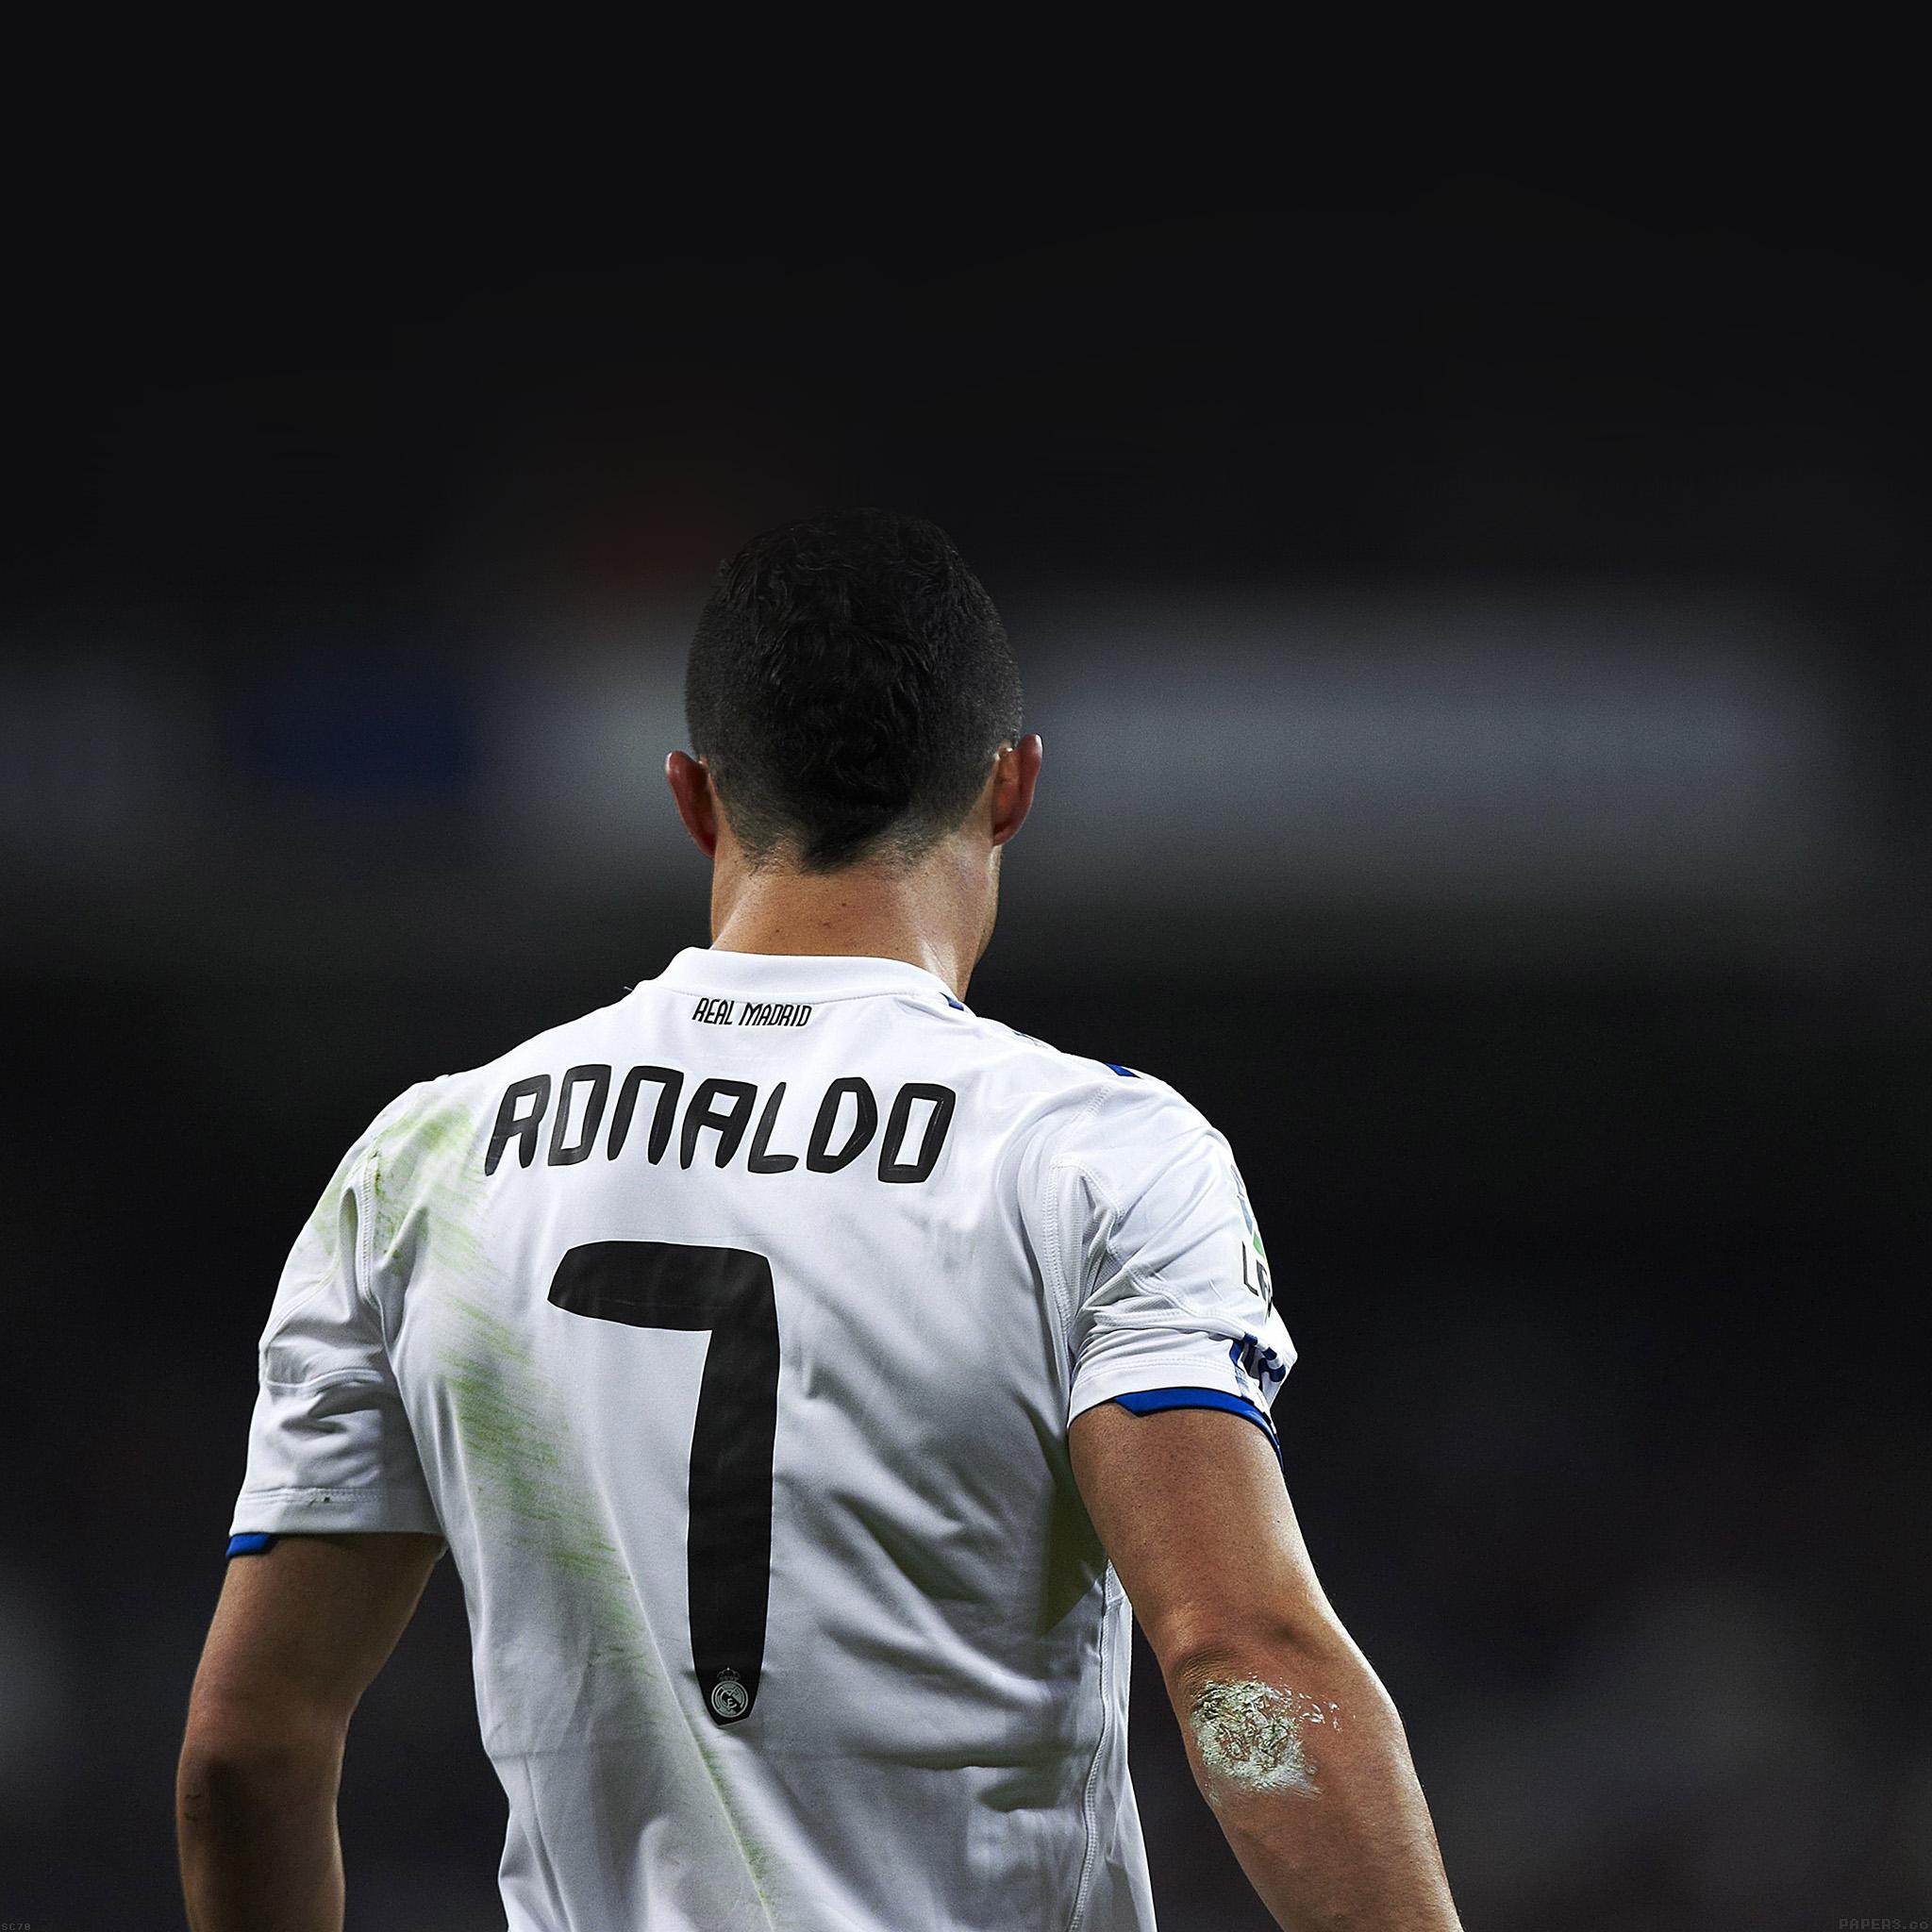 Cristiano Ronaldo Wallpaper: WALLPAPERS